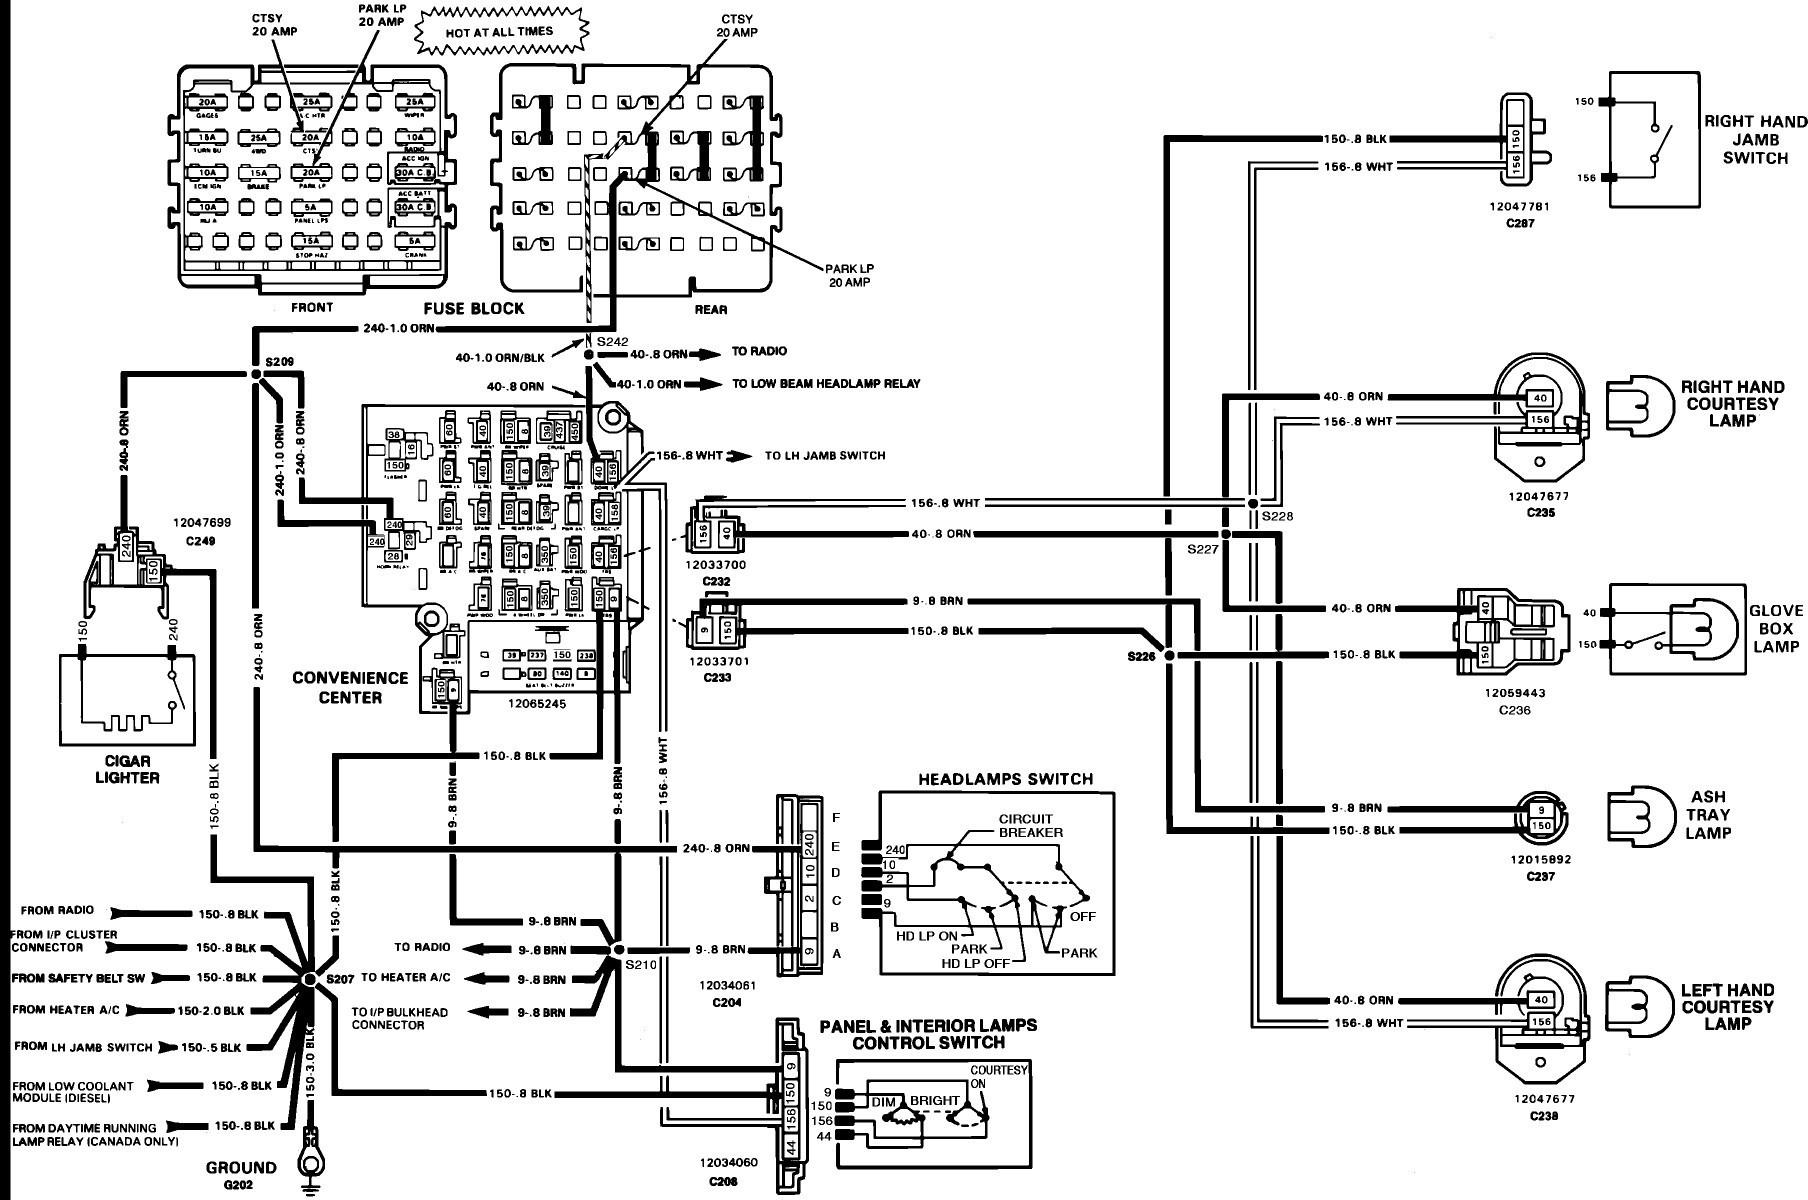 91 s10 tail light wiring diagram